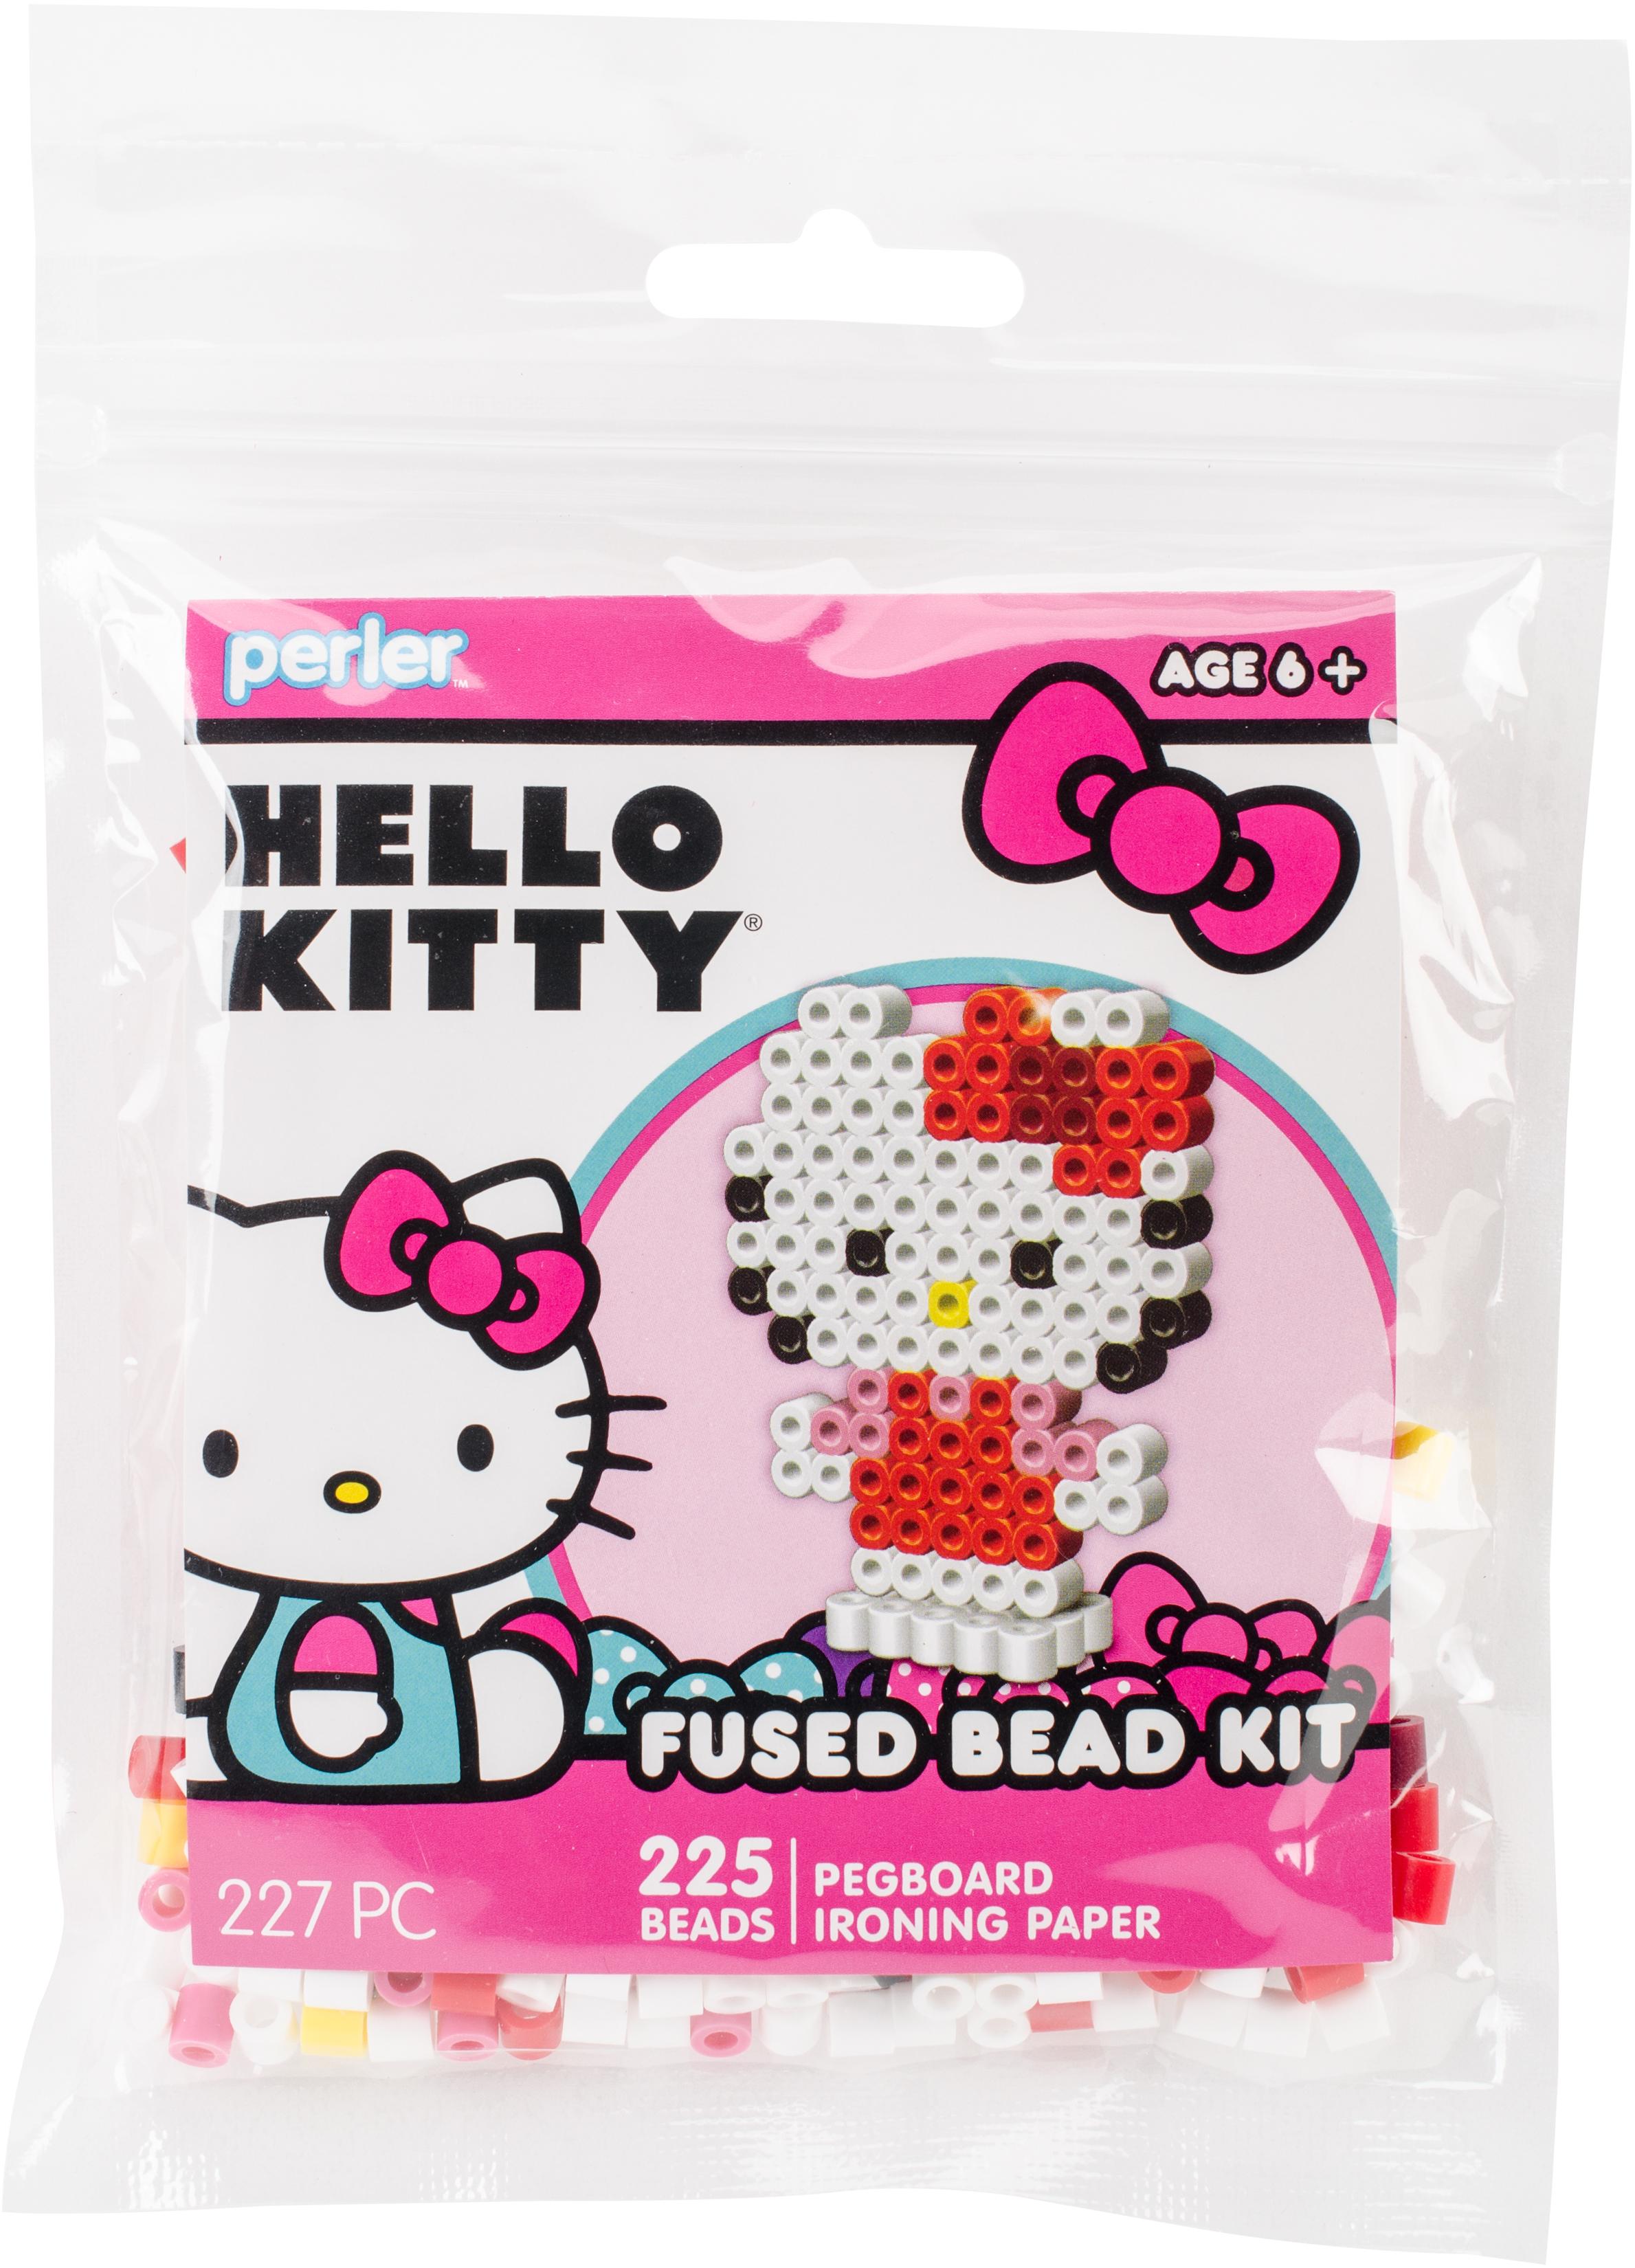 Perler Fused Bead Trial Kit-Hello Kitty 3D